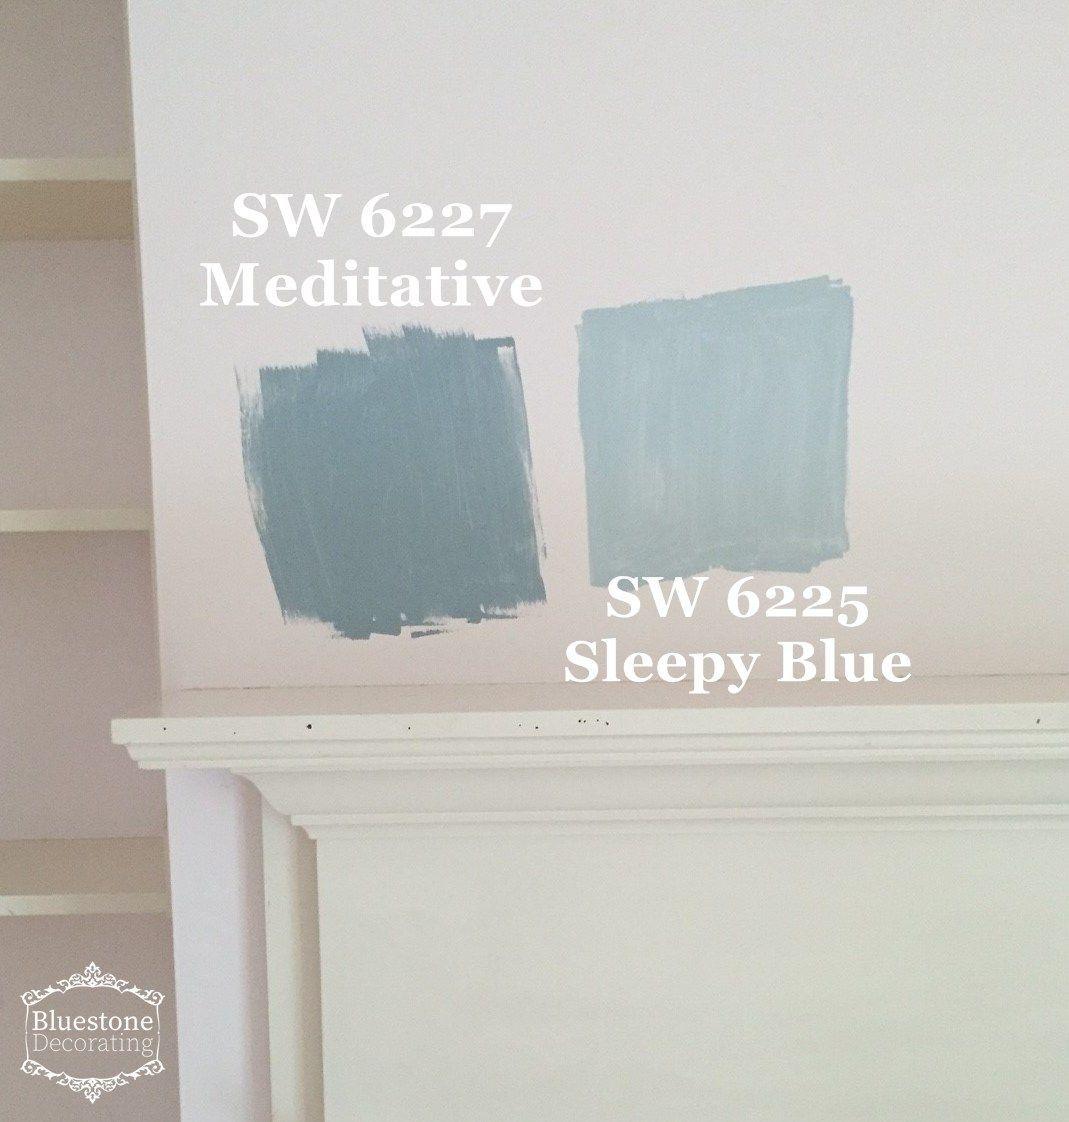 Modern Farmhouse Color Sw 6227 Meditative 6225 Sleepy Blue Farm House Colors Farmhouse Kitchen Colors Farmhouse Color Palette